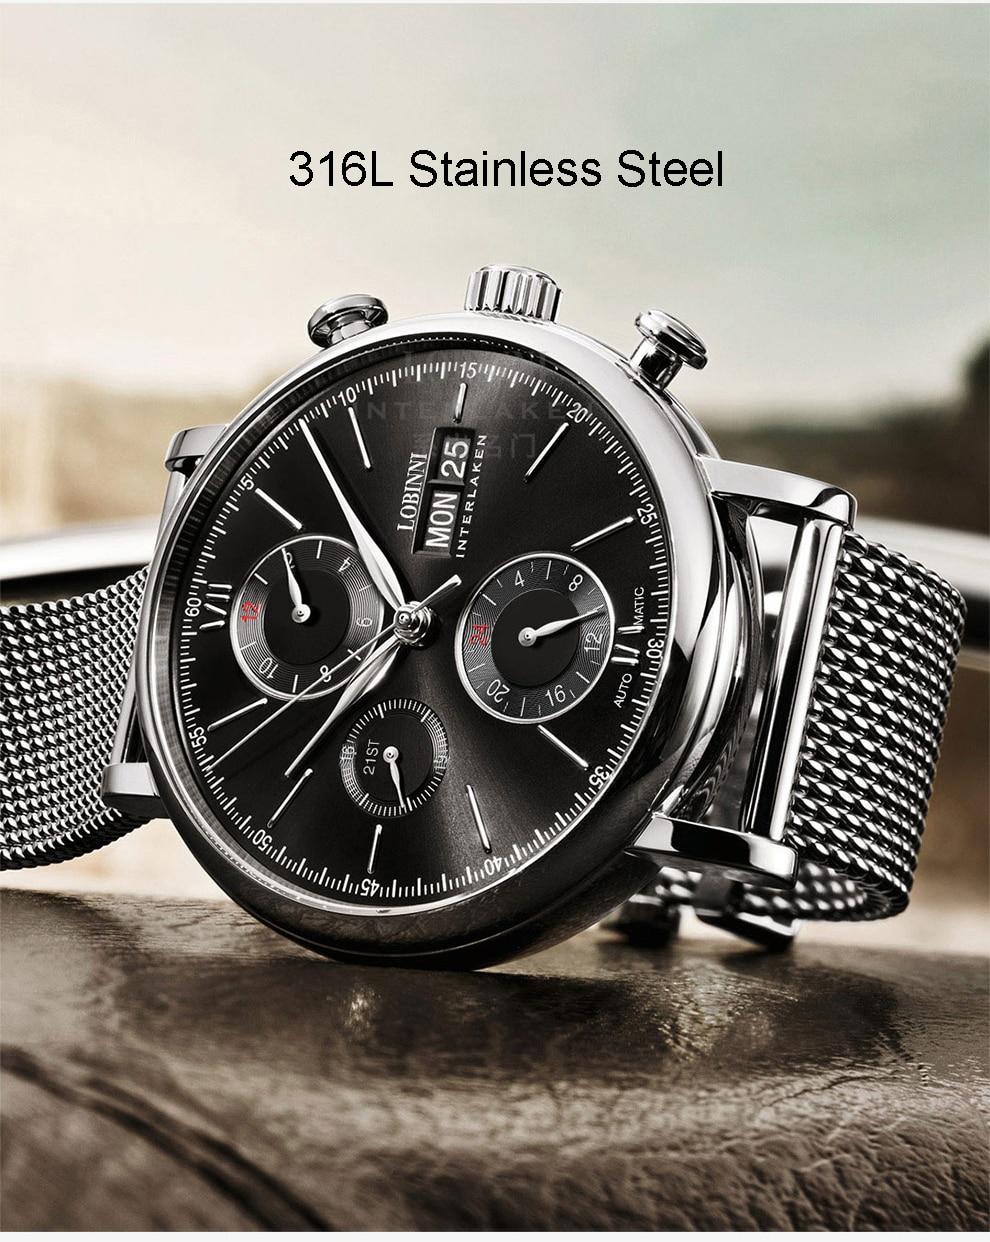 HTB1aQfbVgHqK1RjSZJnq6zNLpXaE Switzerland LOBINNI Men Watches Luxury Brand Perpetual Calender Auto Mechanical Men's Clock Sapphire Leather relogio L13019-6